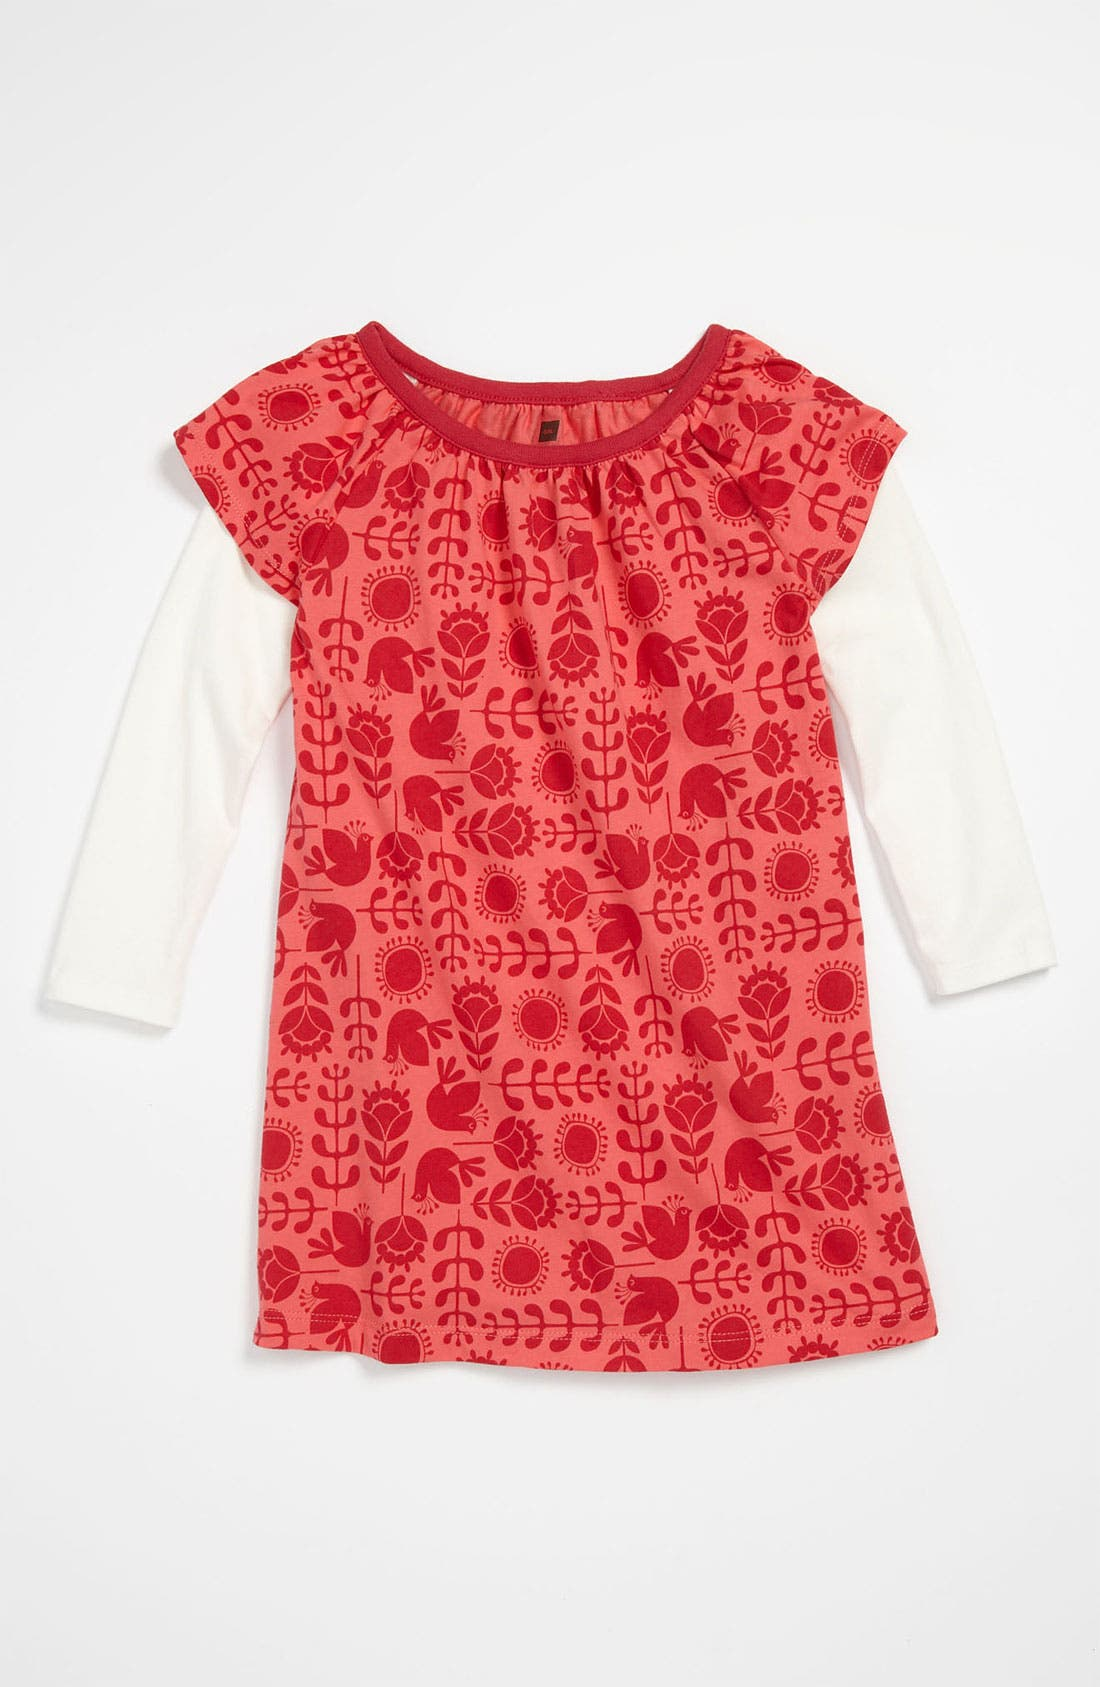 Main Image - Tea Collection 'Swedish Lark' Dress (Infant)